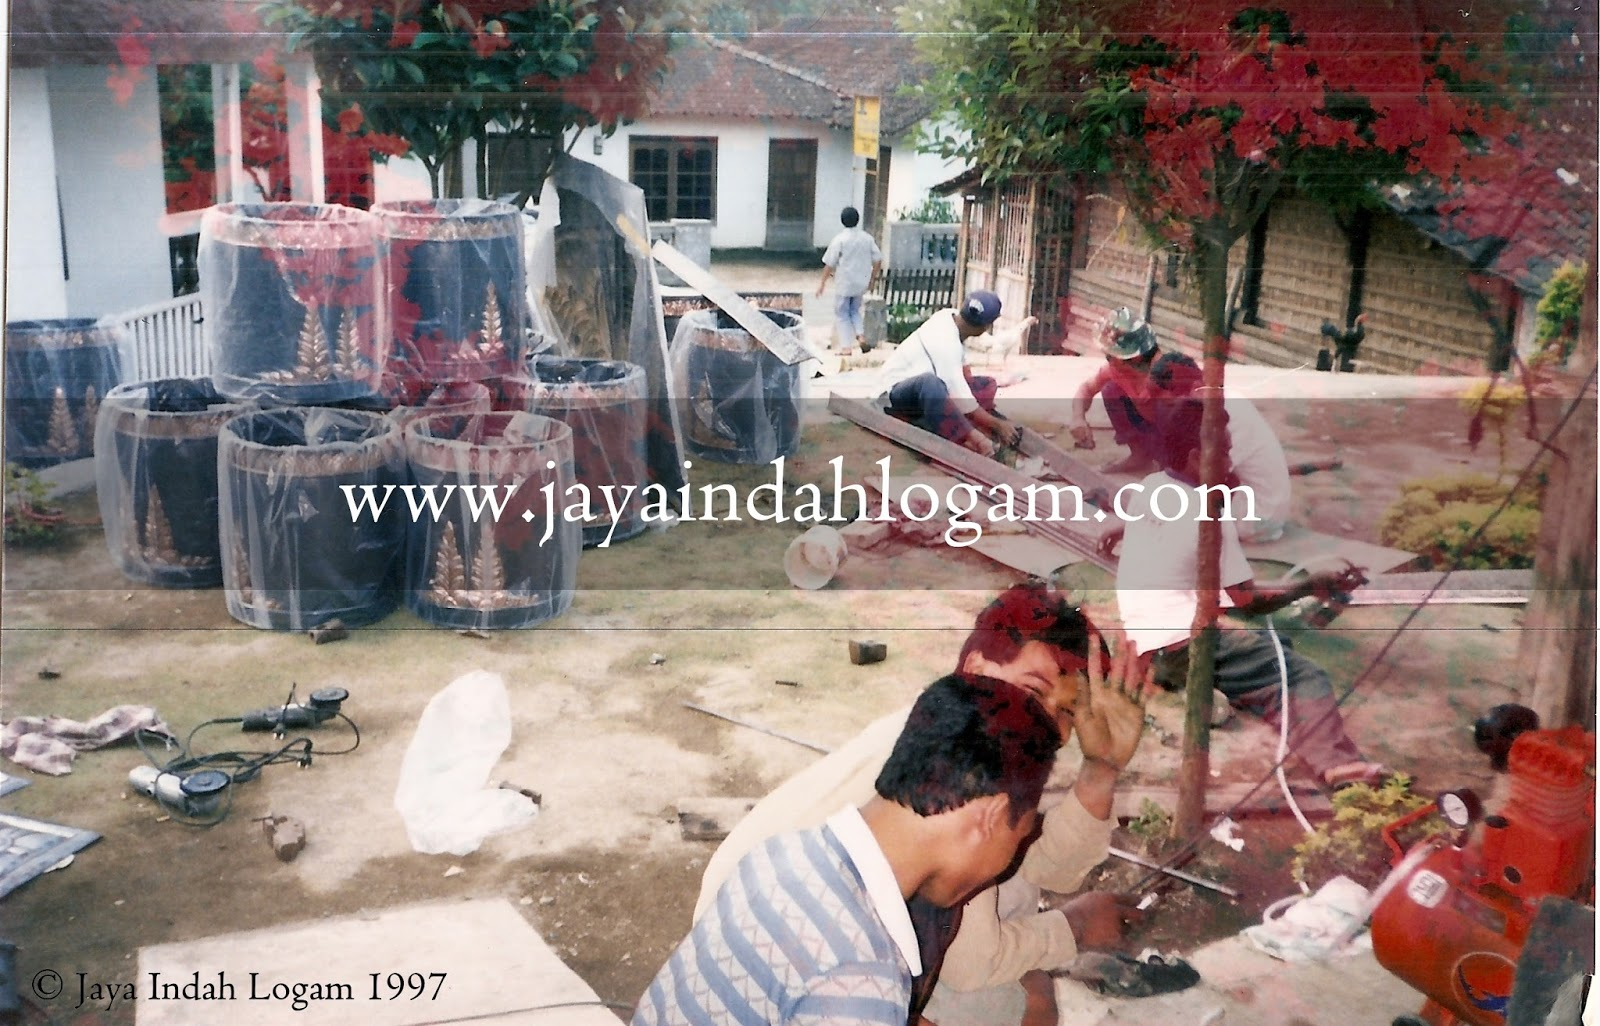 Foto proses pengerjaan pembuatan produk kerajinan ukir logam tembaga dan kuningan oleh Jaya Indah Logam Art Gallery